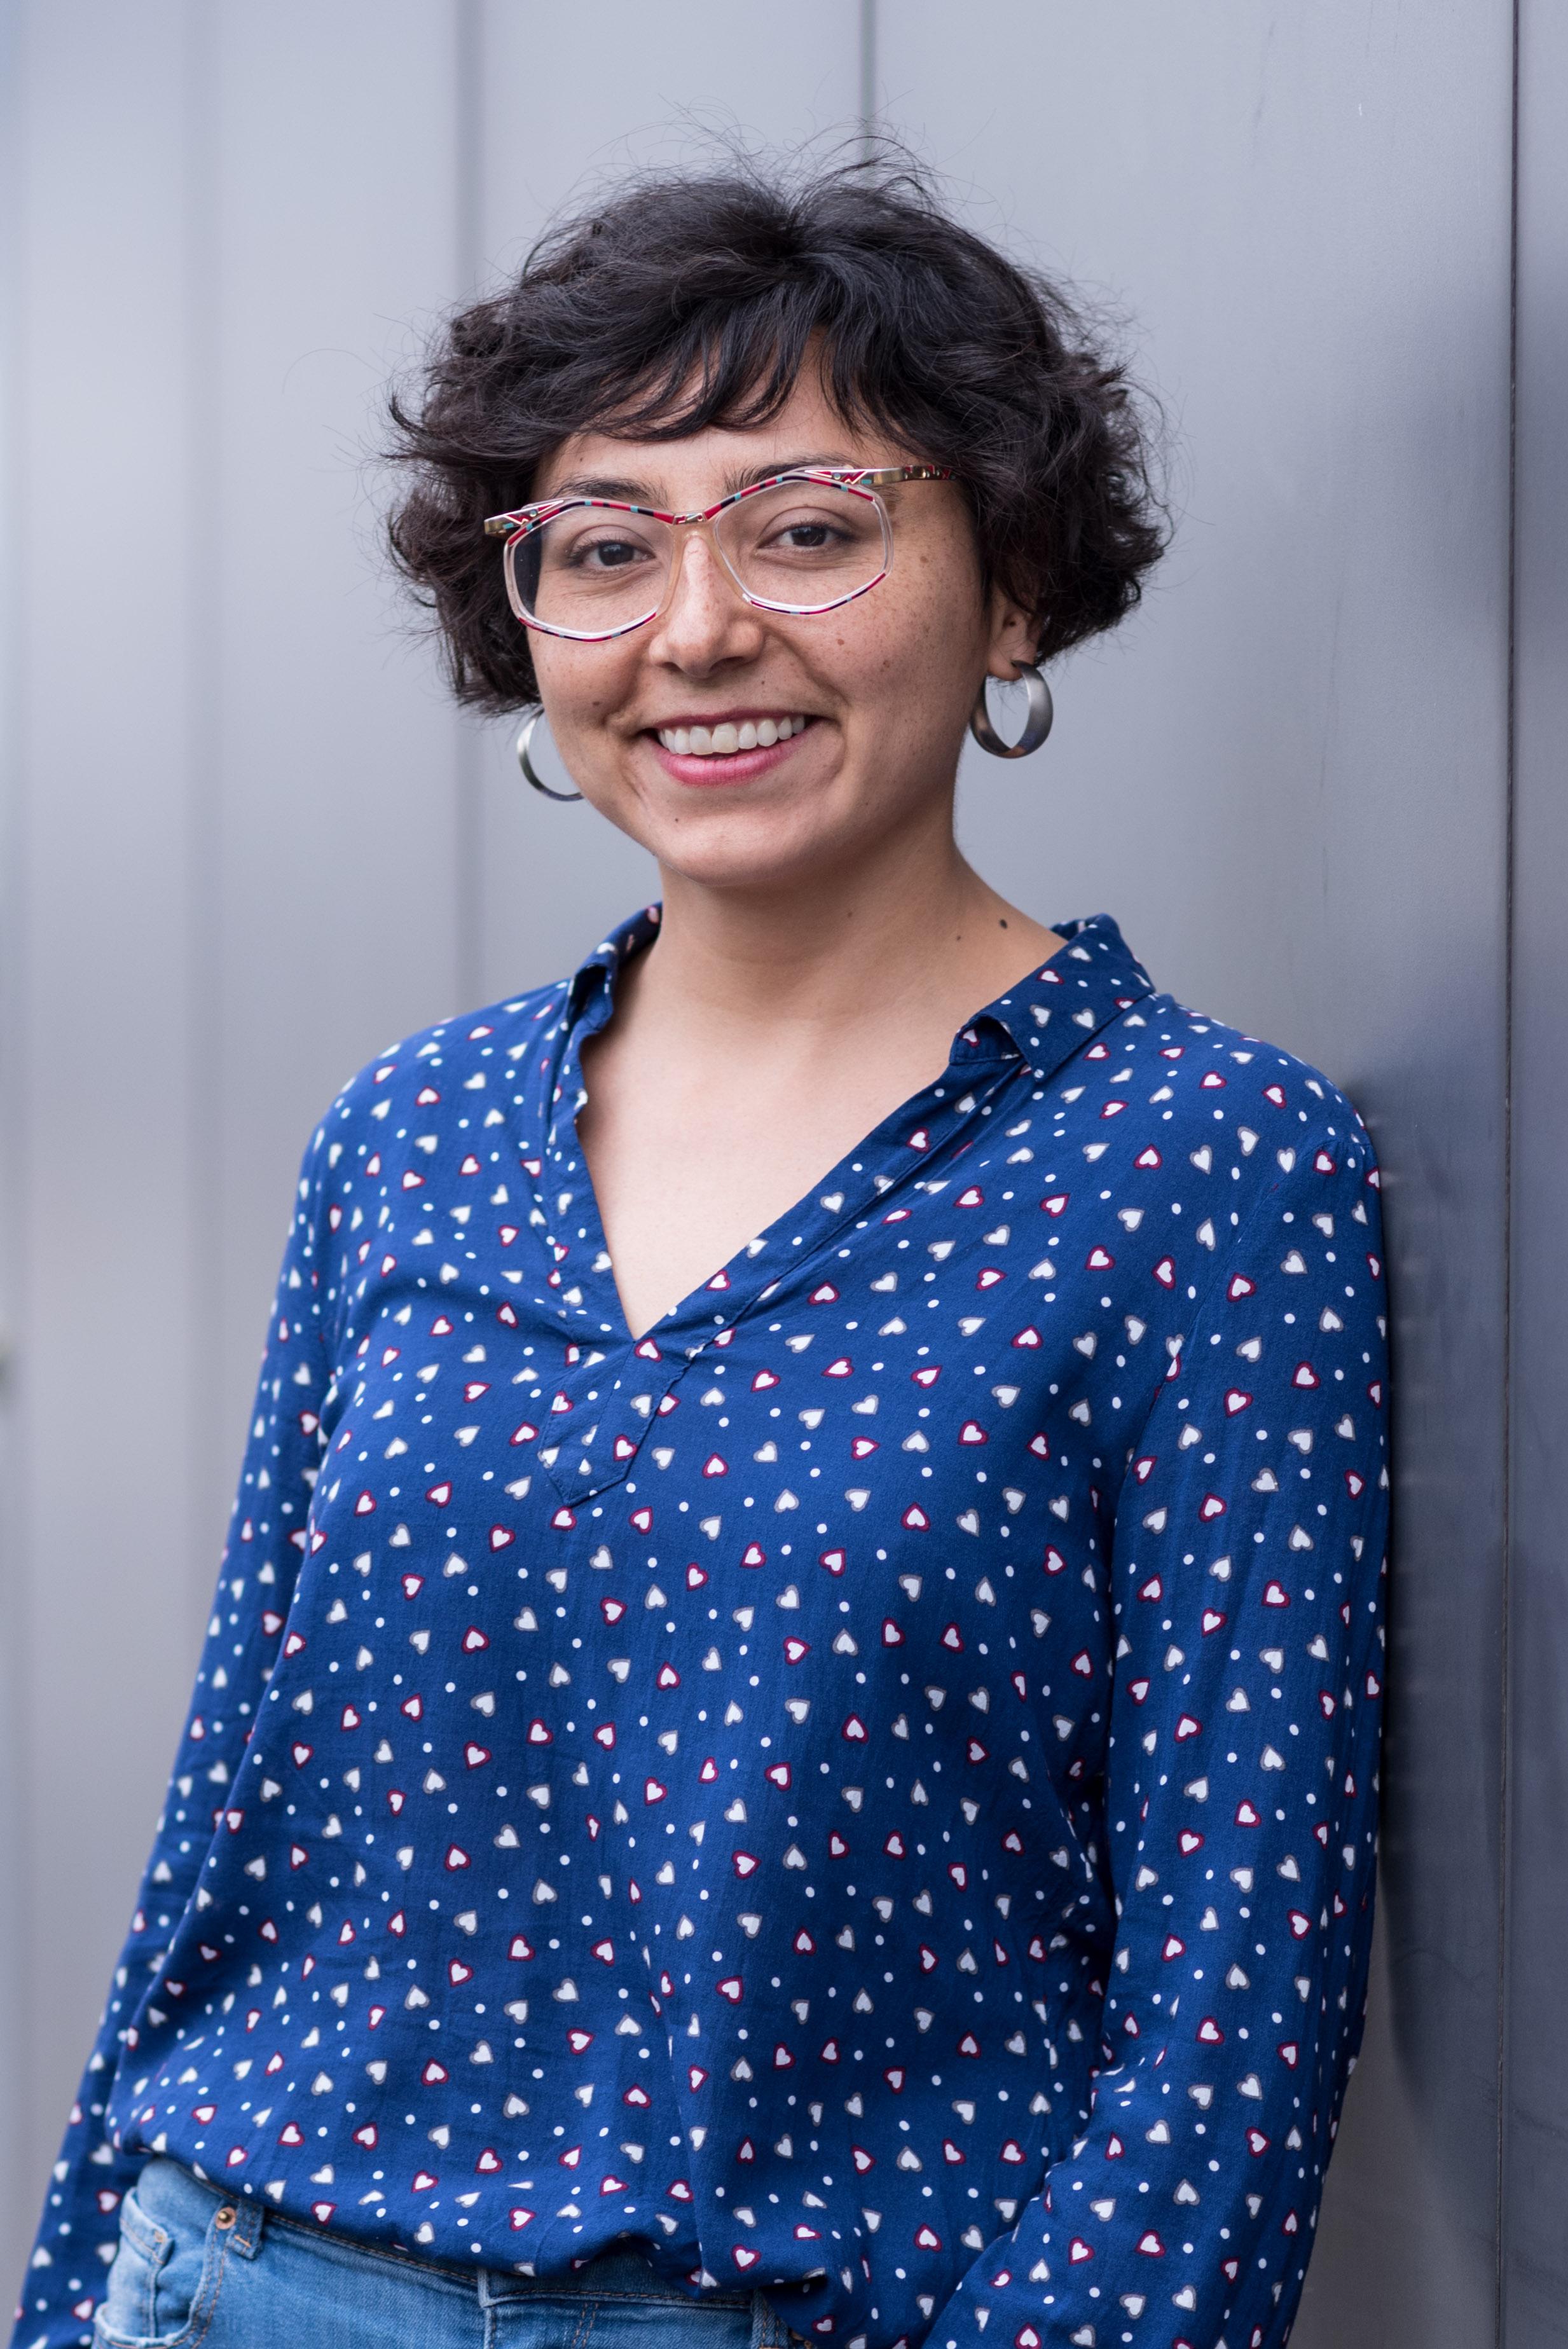 Anita Peña Saavedra - 2018-19 Atlantic Fellow for Social and Economic Equity